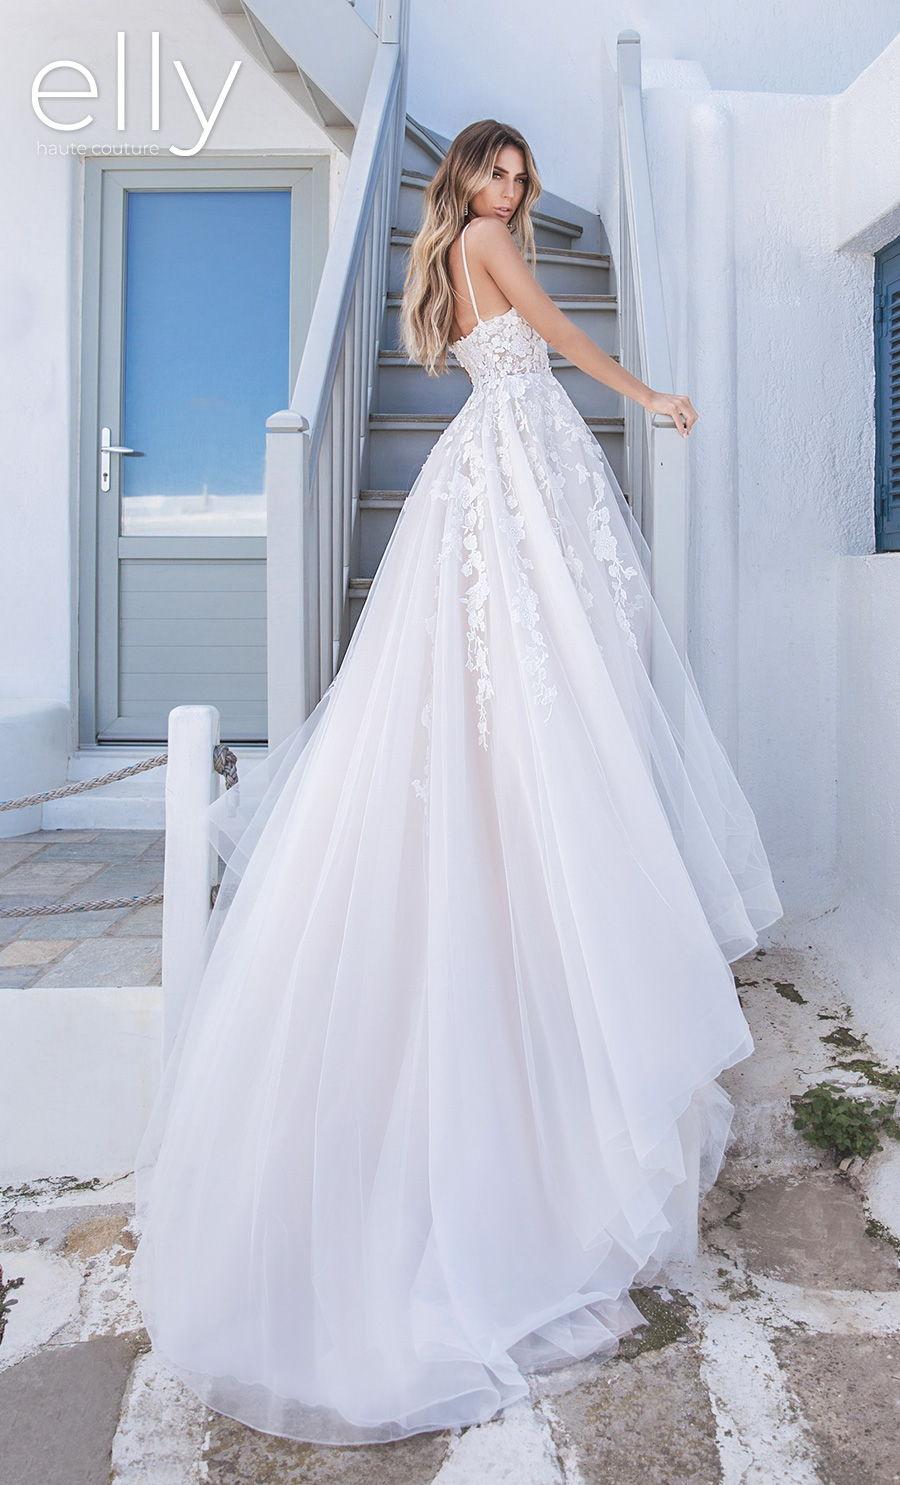 elly bride 2020 white mykonos bridal sleeveless spaghetti strap sweetheart neckline heavily embellished bodice romantic a  line wedding dress backless chapel train (monica) bv mv